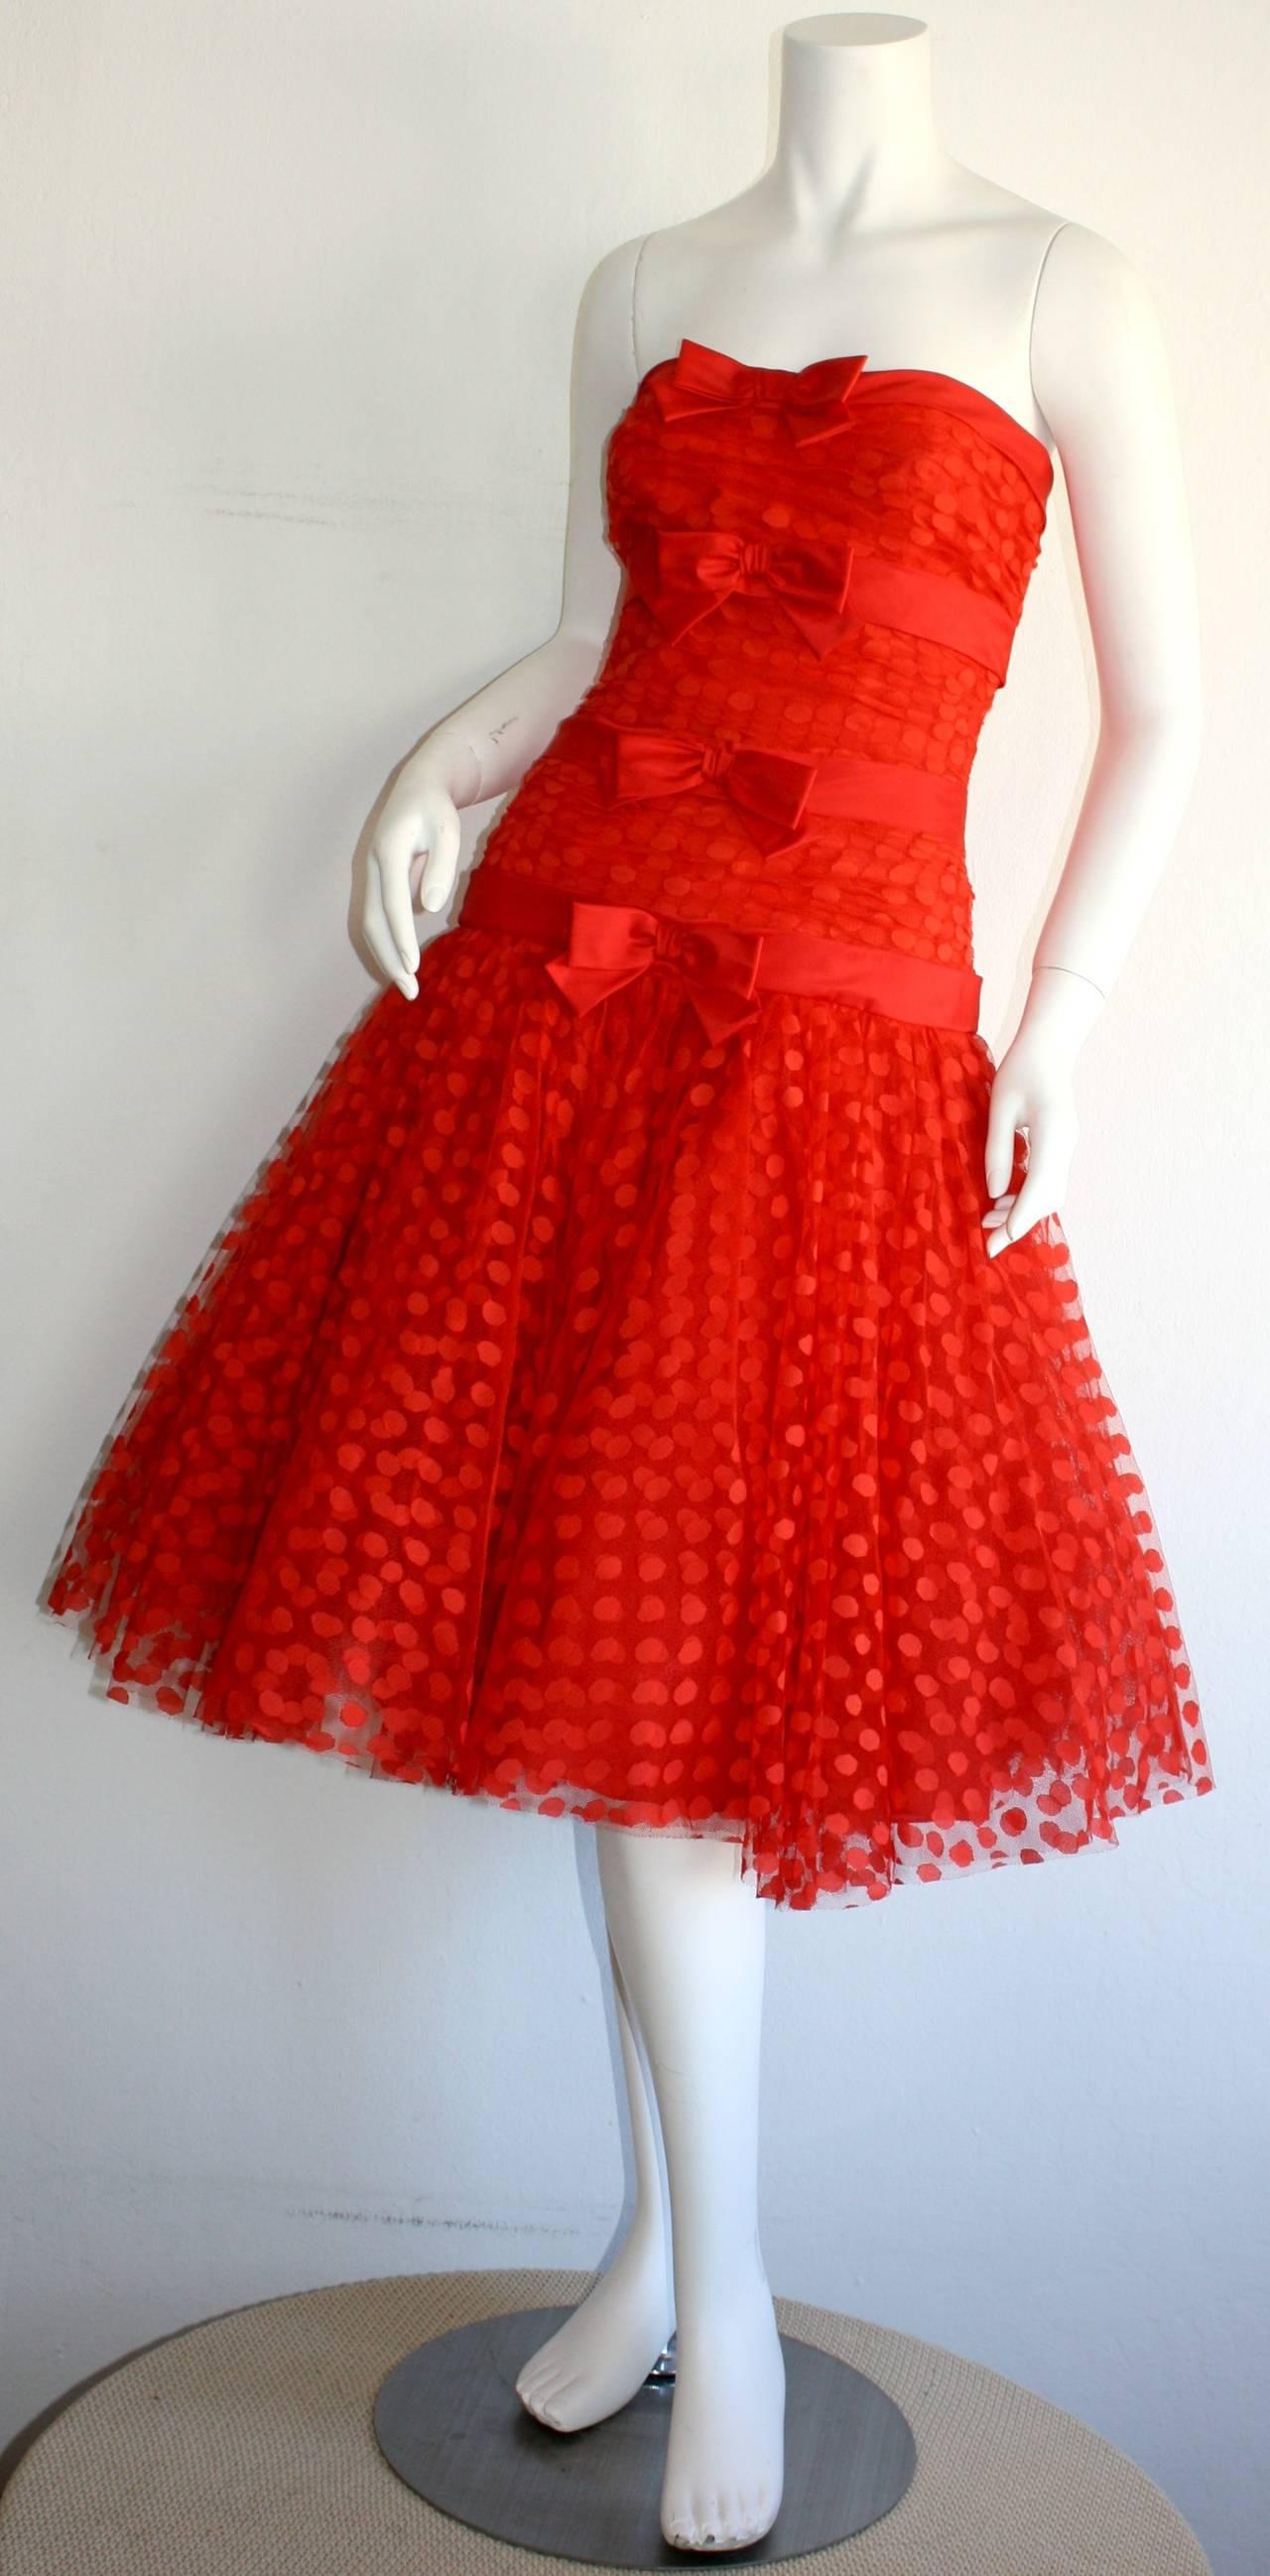 Incredible Vintage Jill Richards for Elizabeth Arden Red Valentine's Day Dress 3